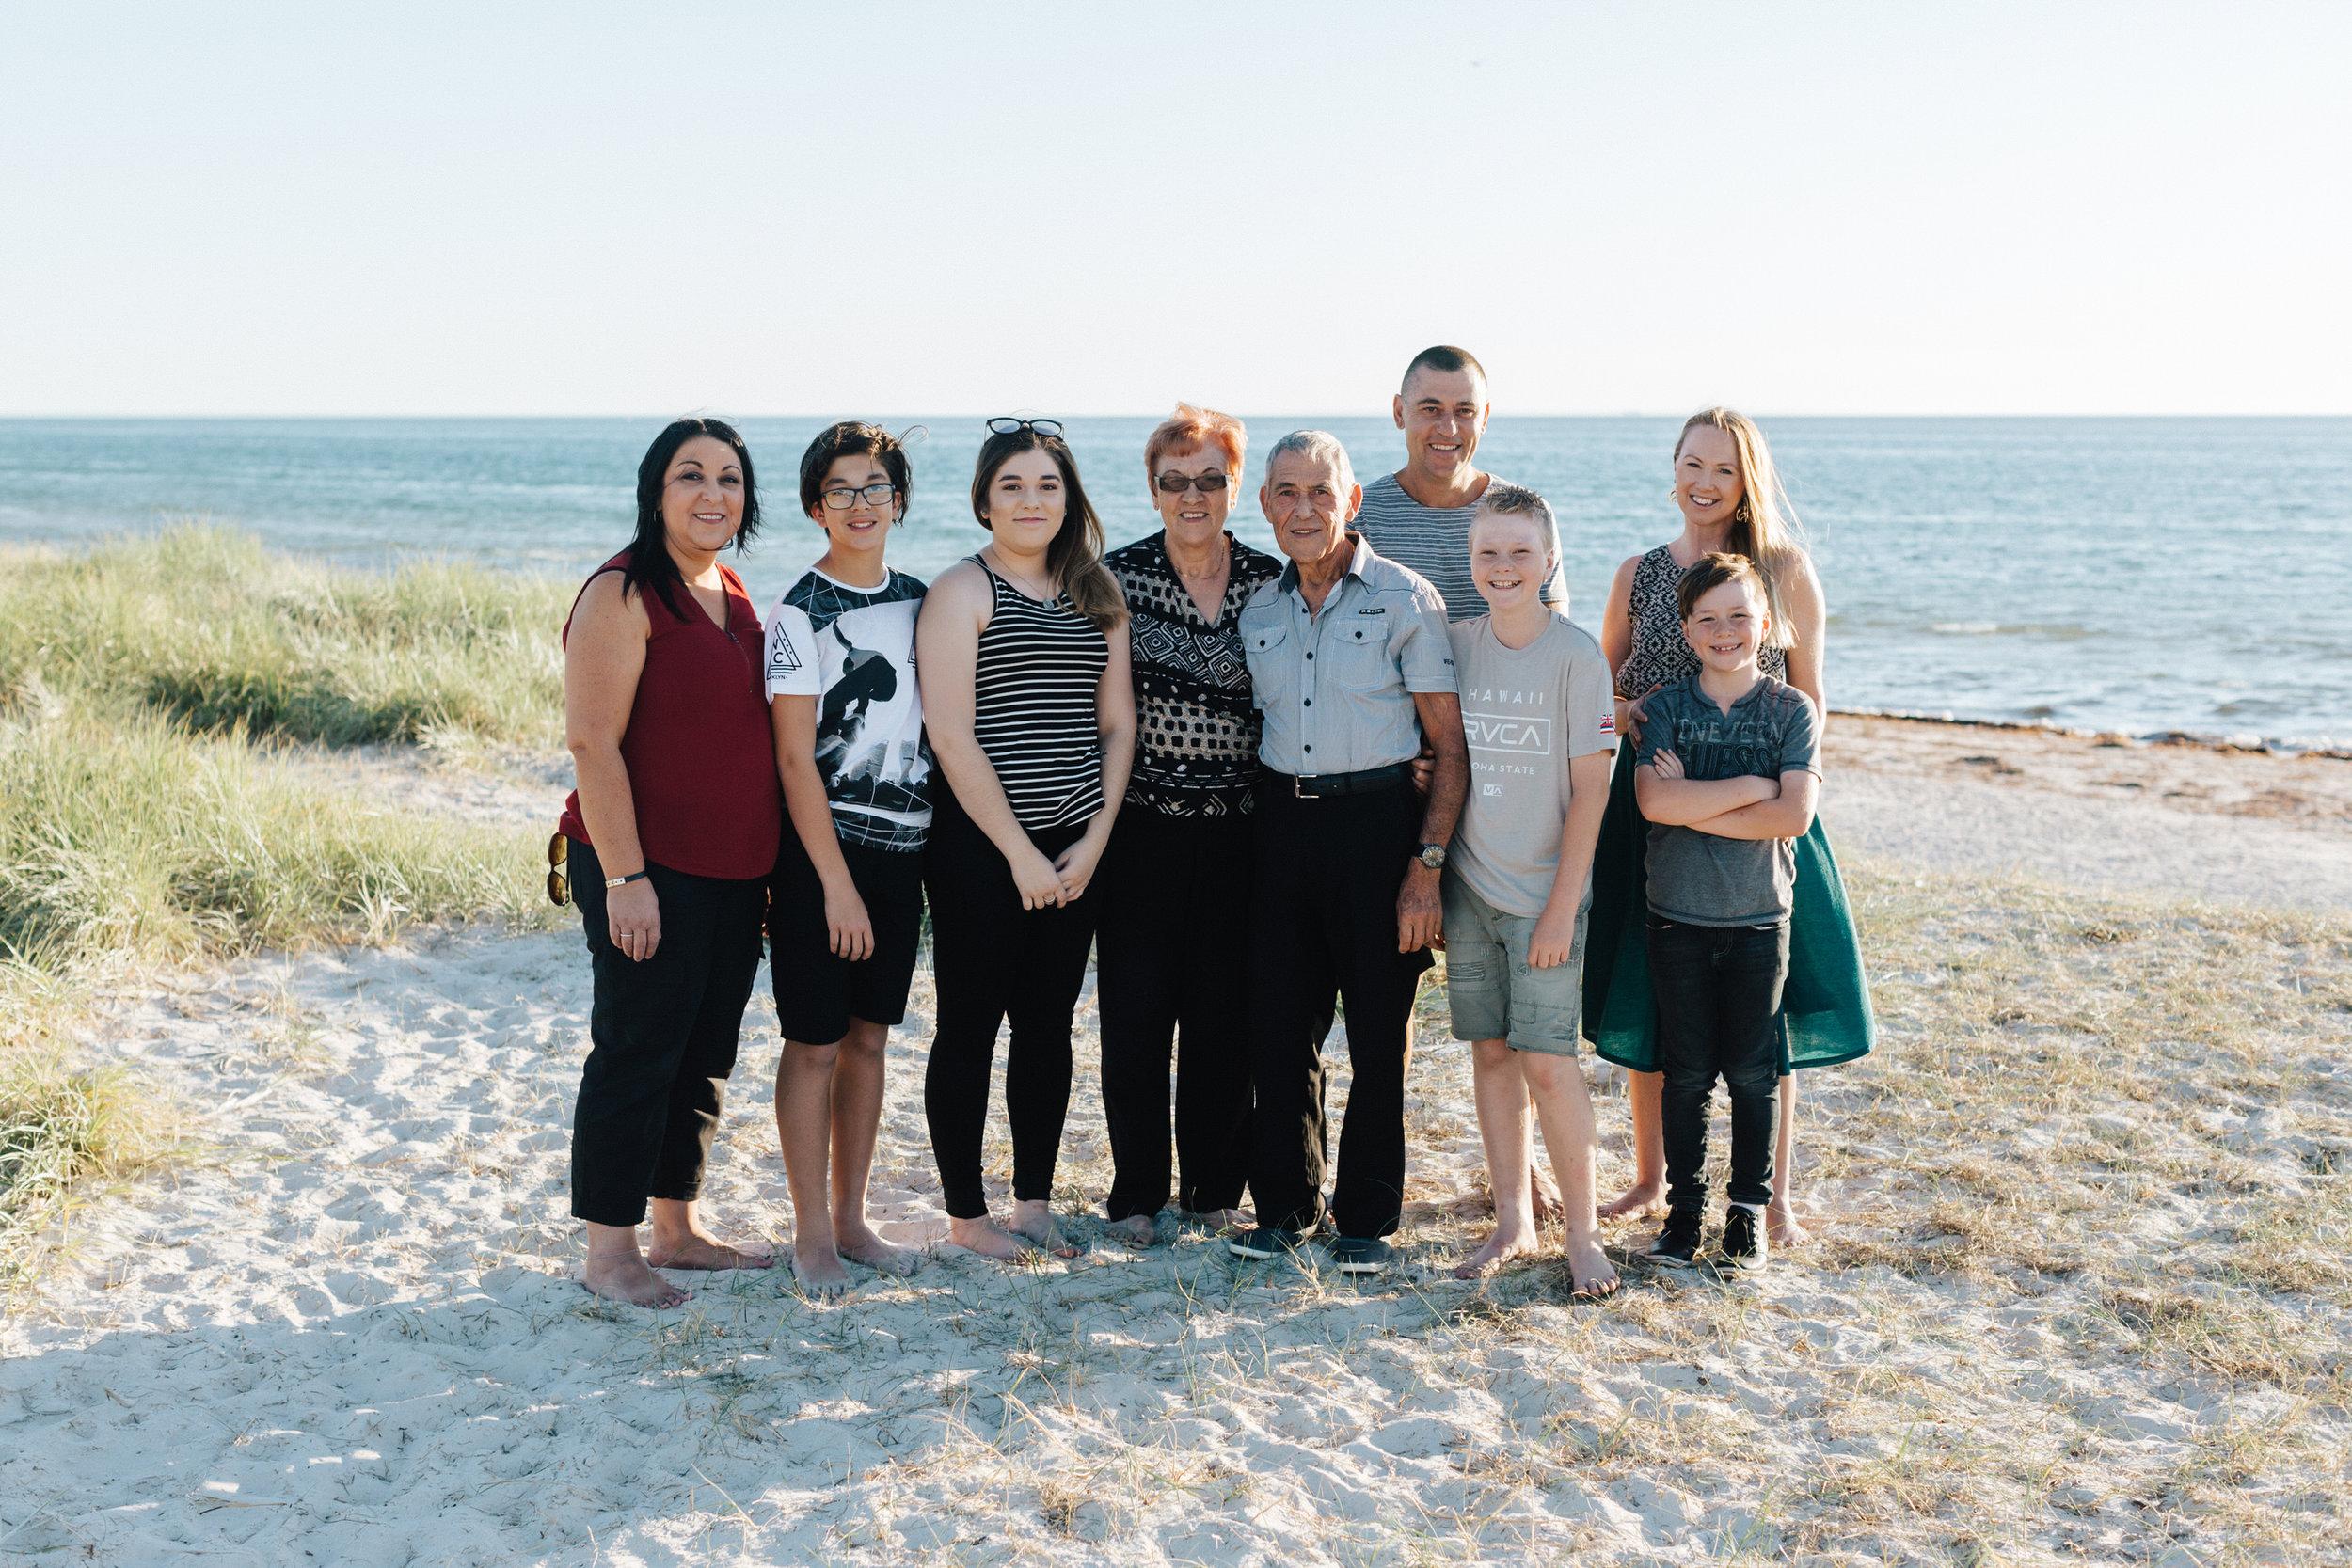 Beach Family Portraits Adelaide 001.jpg